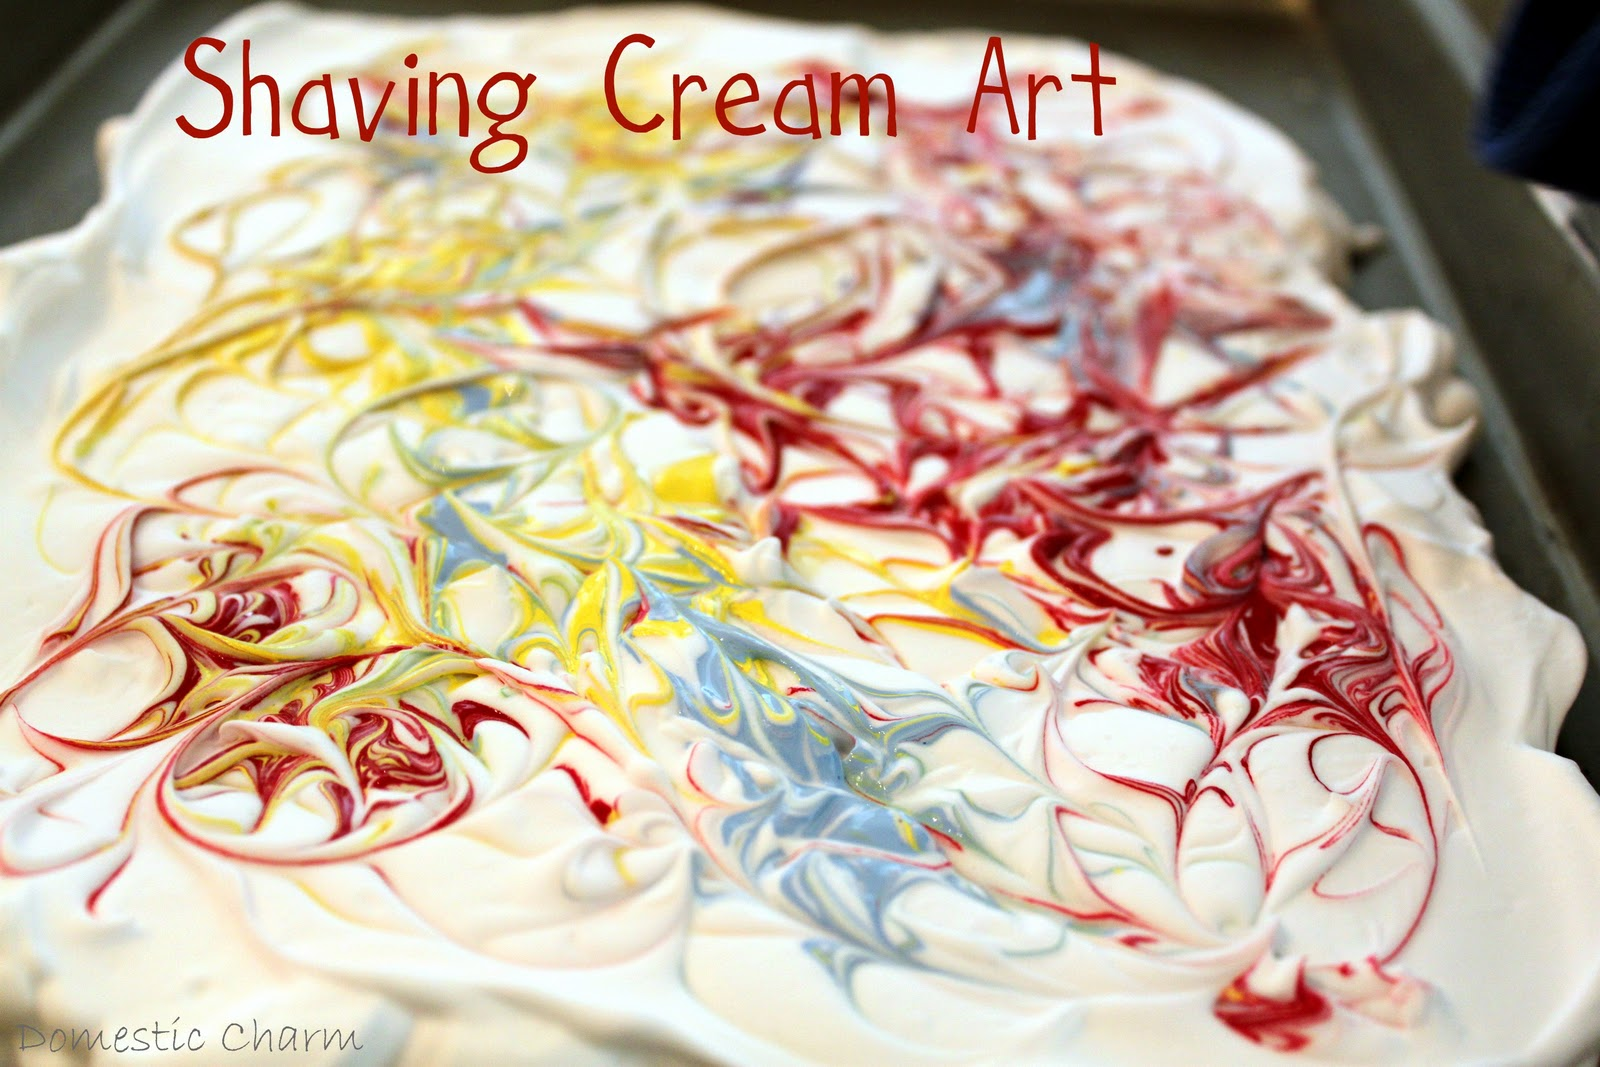 http://2.bp.blogspot.com/-MqtSAjdCyt4/TxybxliMD5I/AAAAAAAAGU8/2EifmDN73qM/s1600/shaving-cream-art.jpg